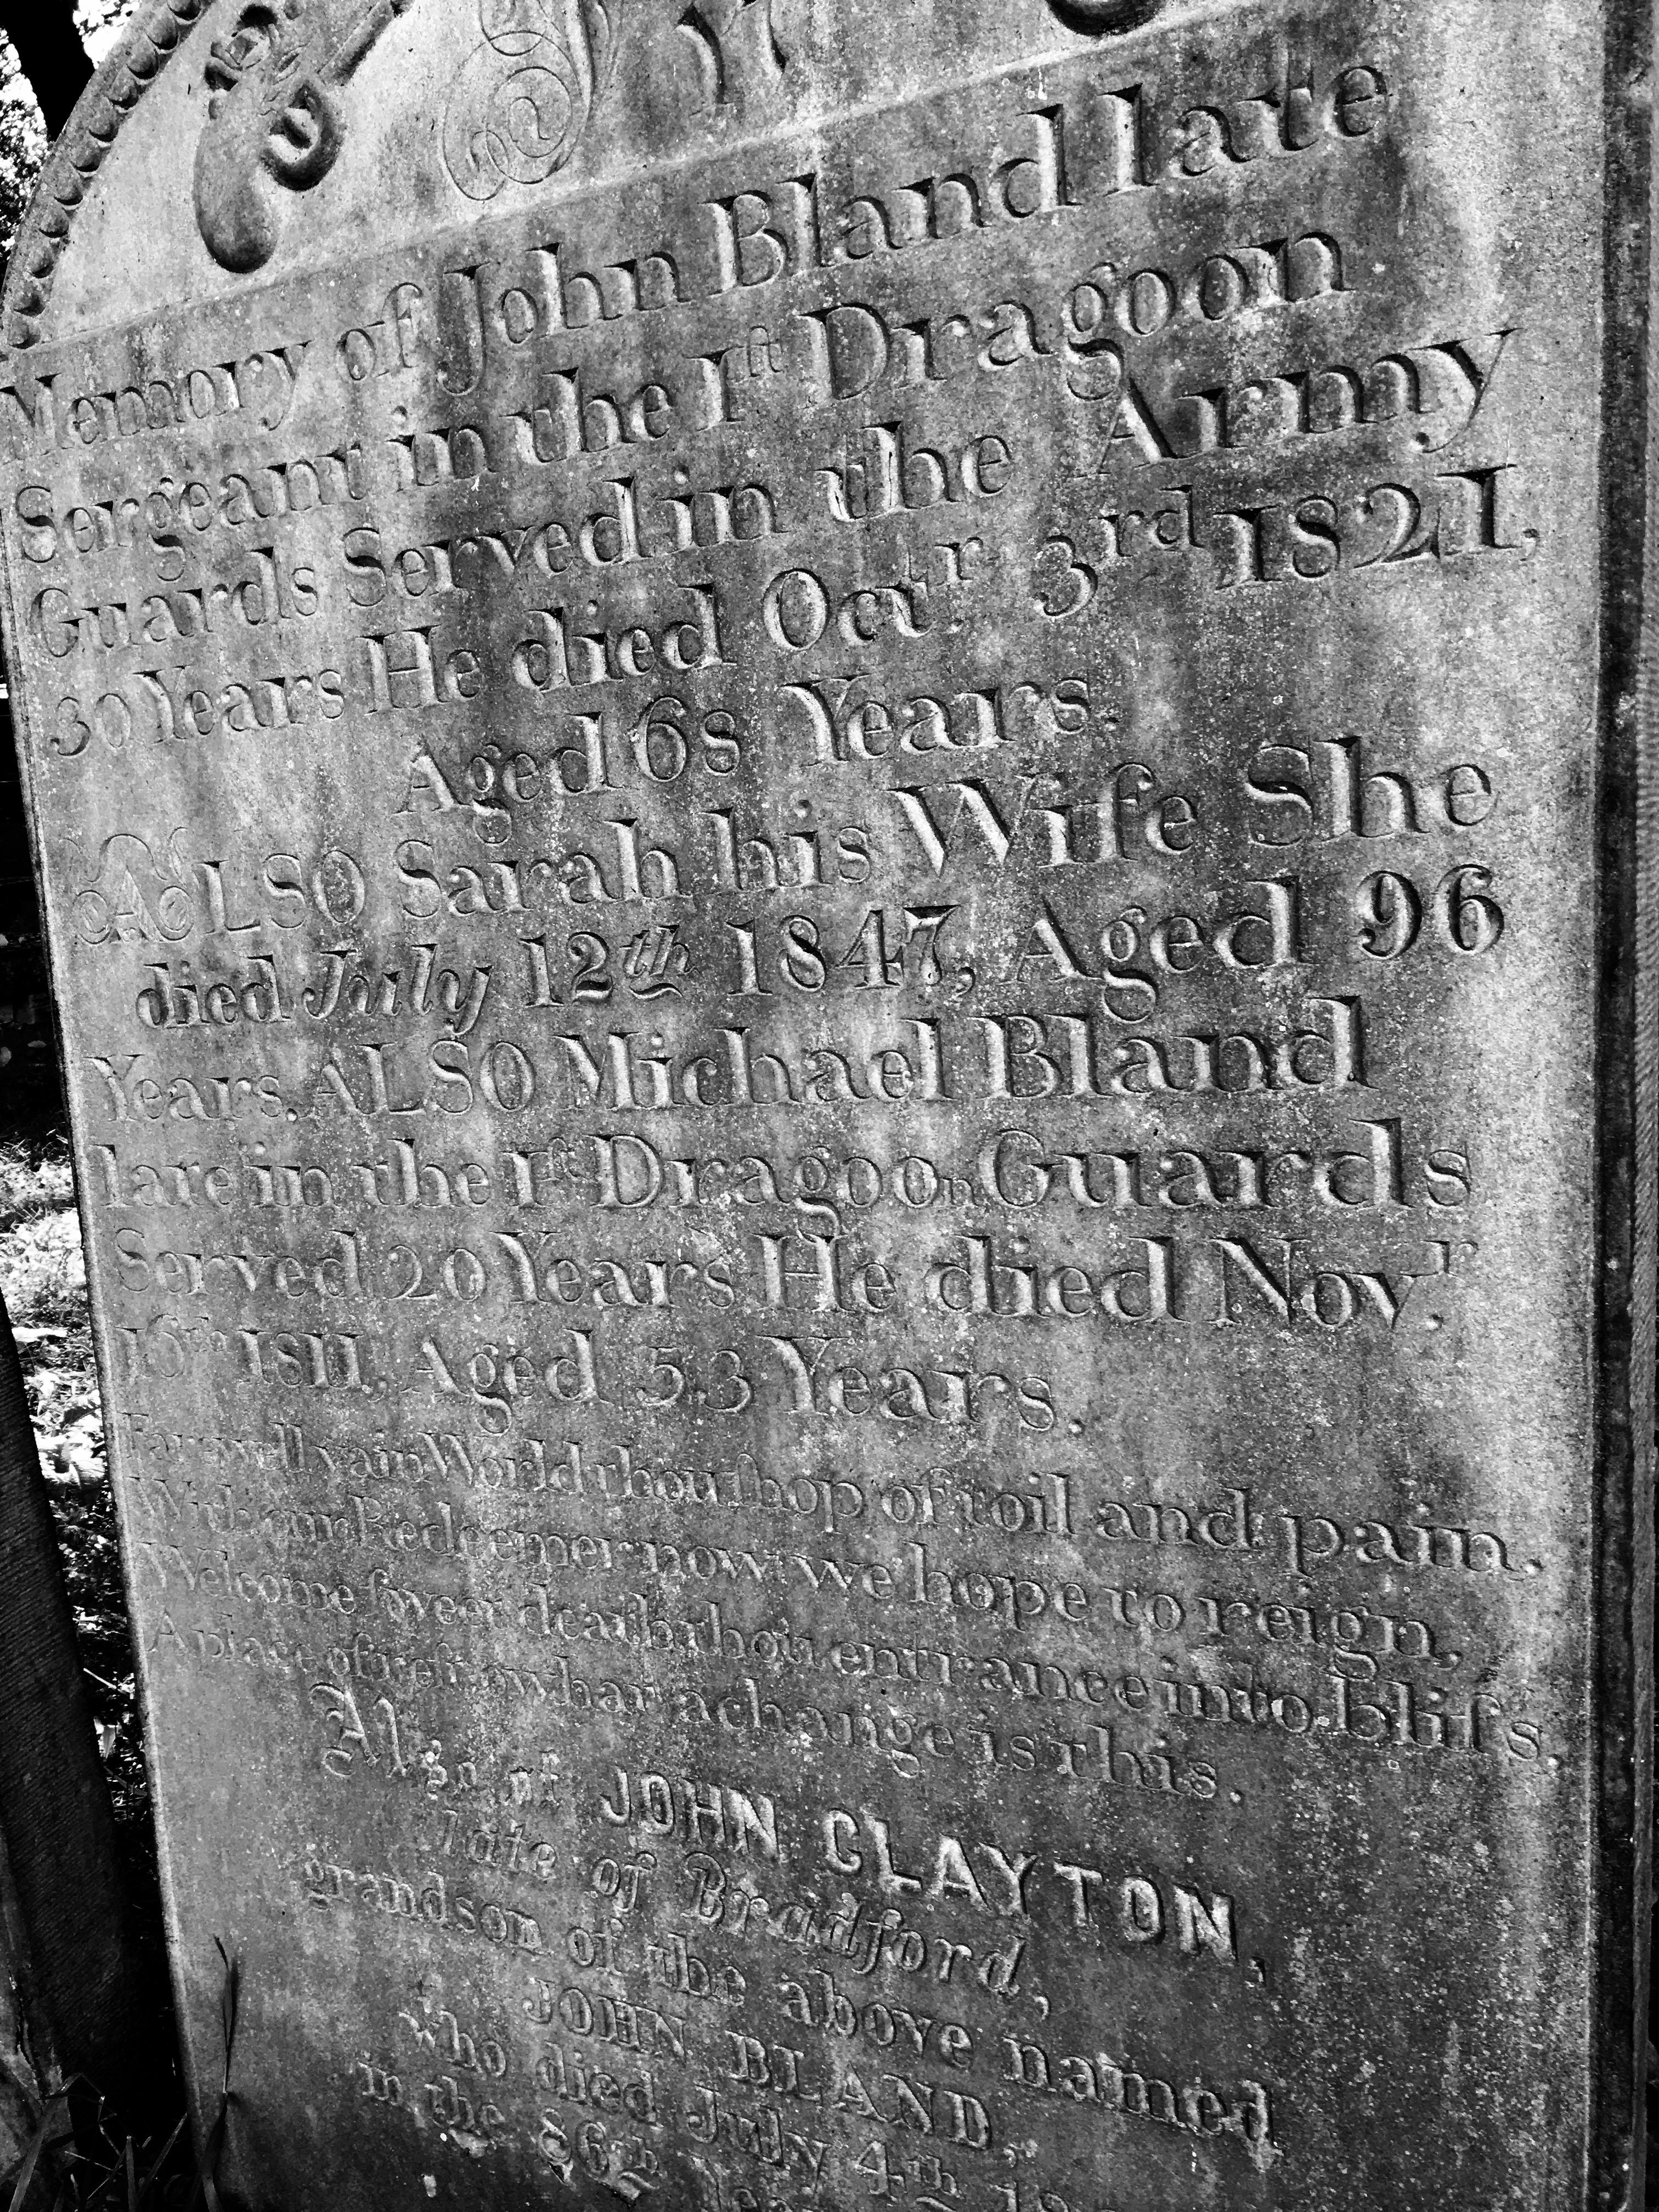 John Bland – Haworth